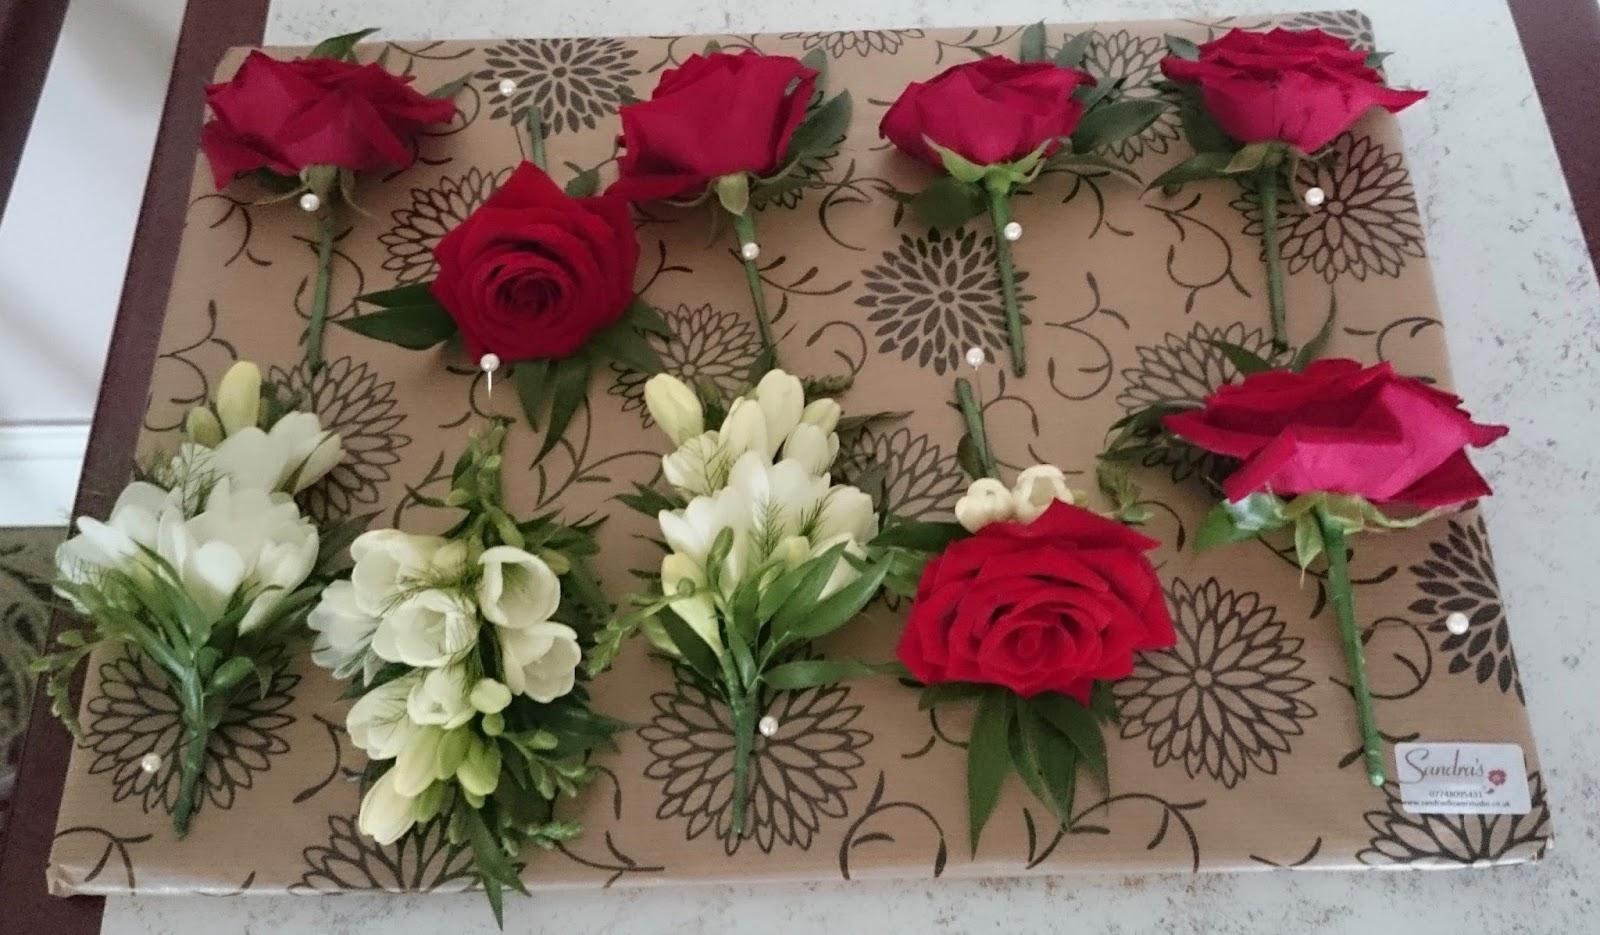 Sandras Flower Studio Red Rose And White Freesia Wedding Flowers